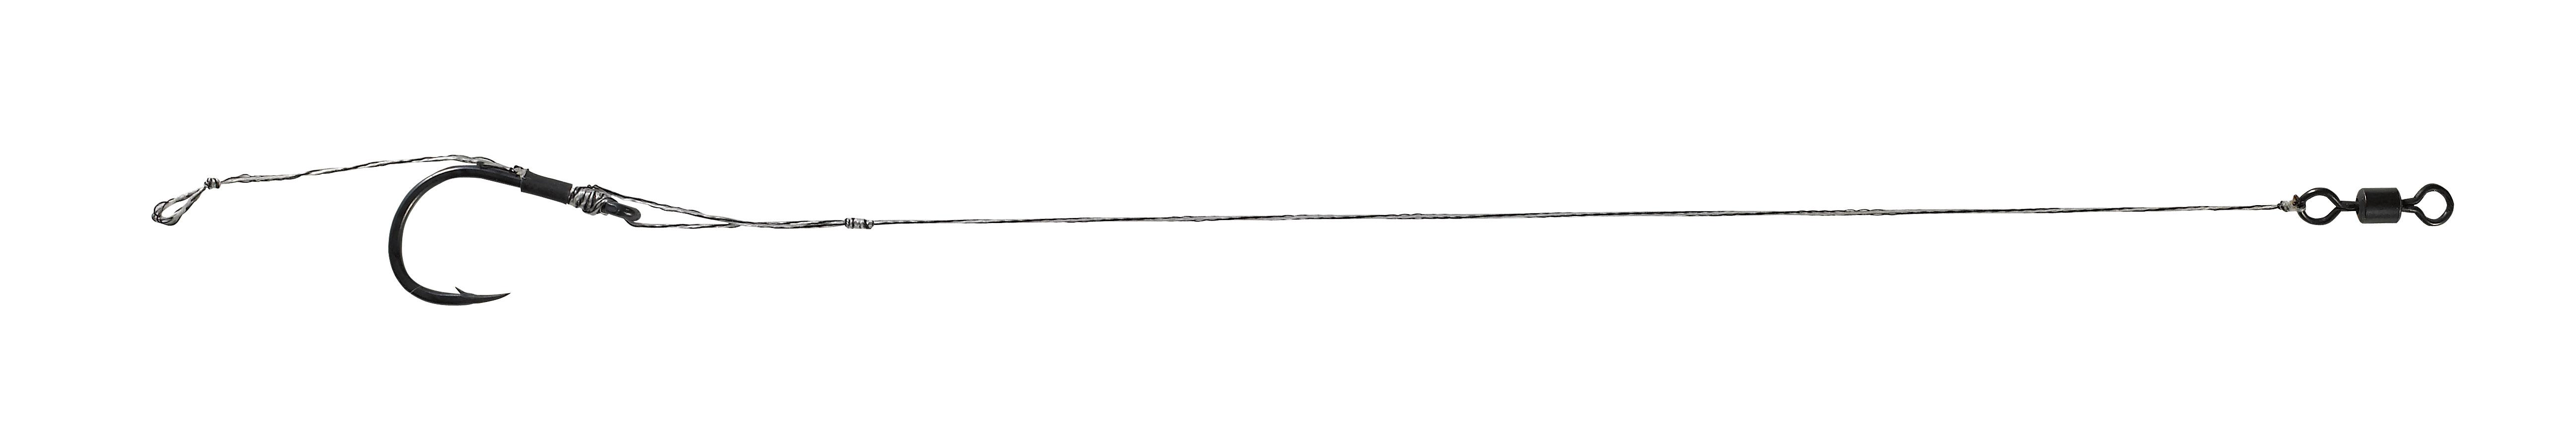 Nadväzec Anaconda Adjustable Hair Rig bez protihrotu č.2